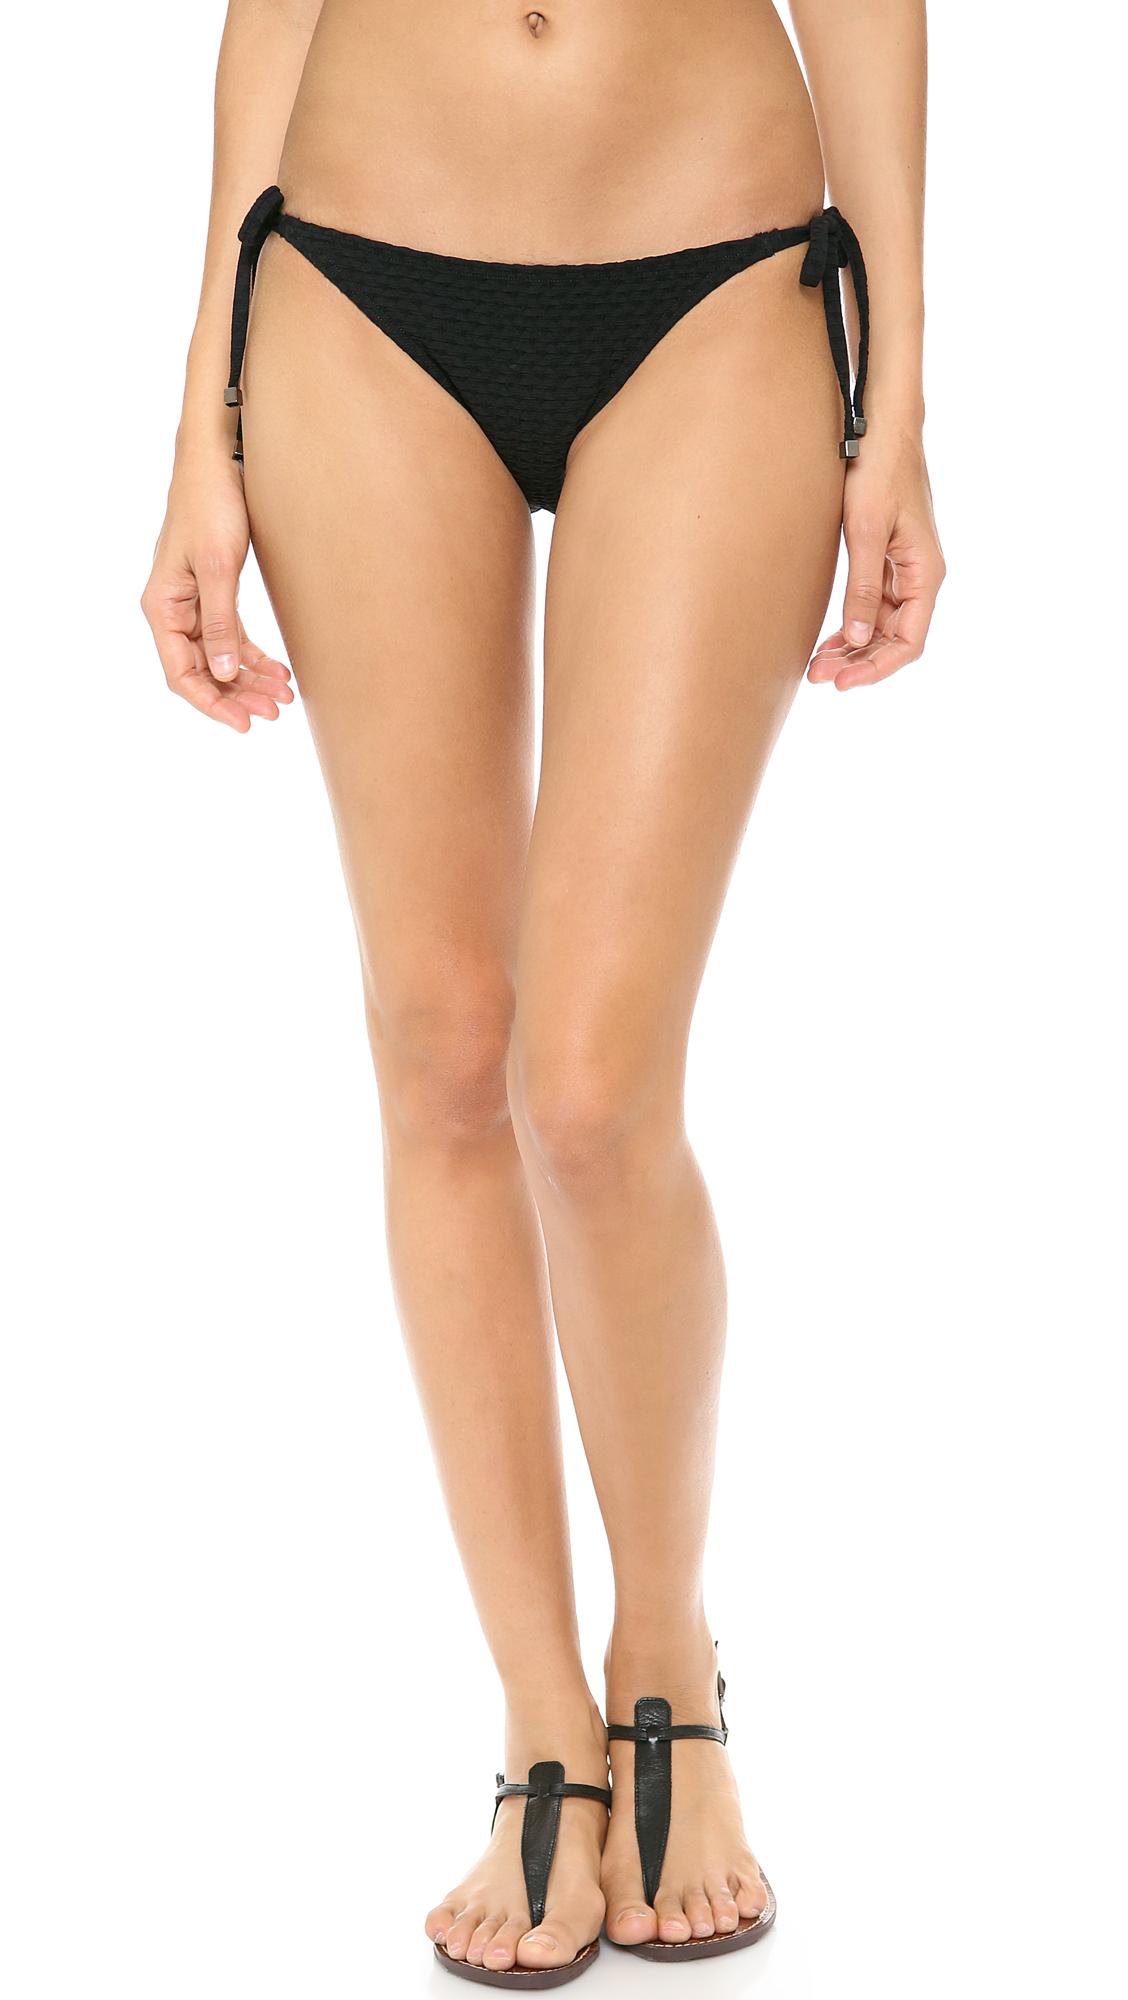 black string bikini bottoms - photo #18